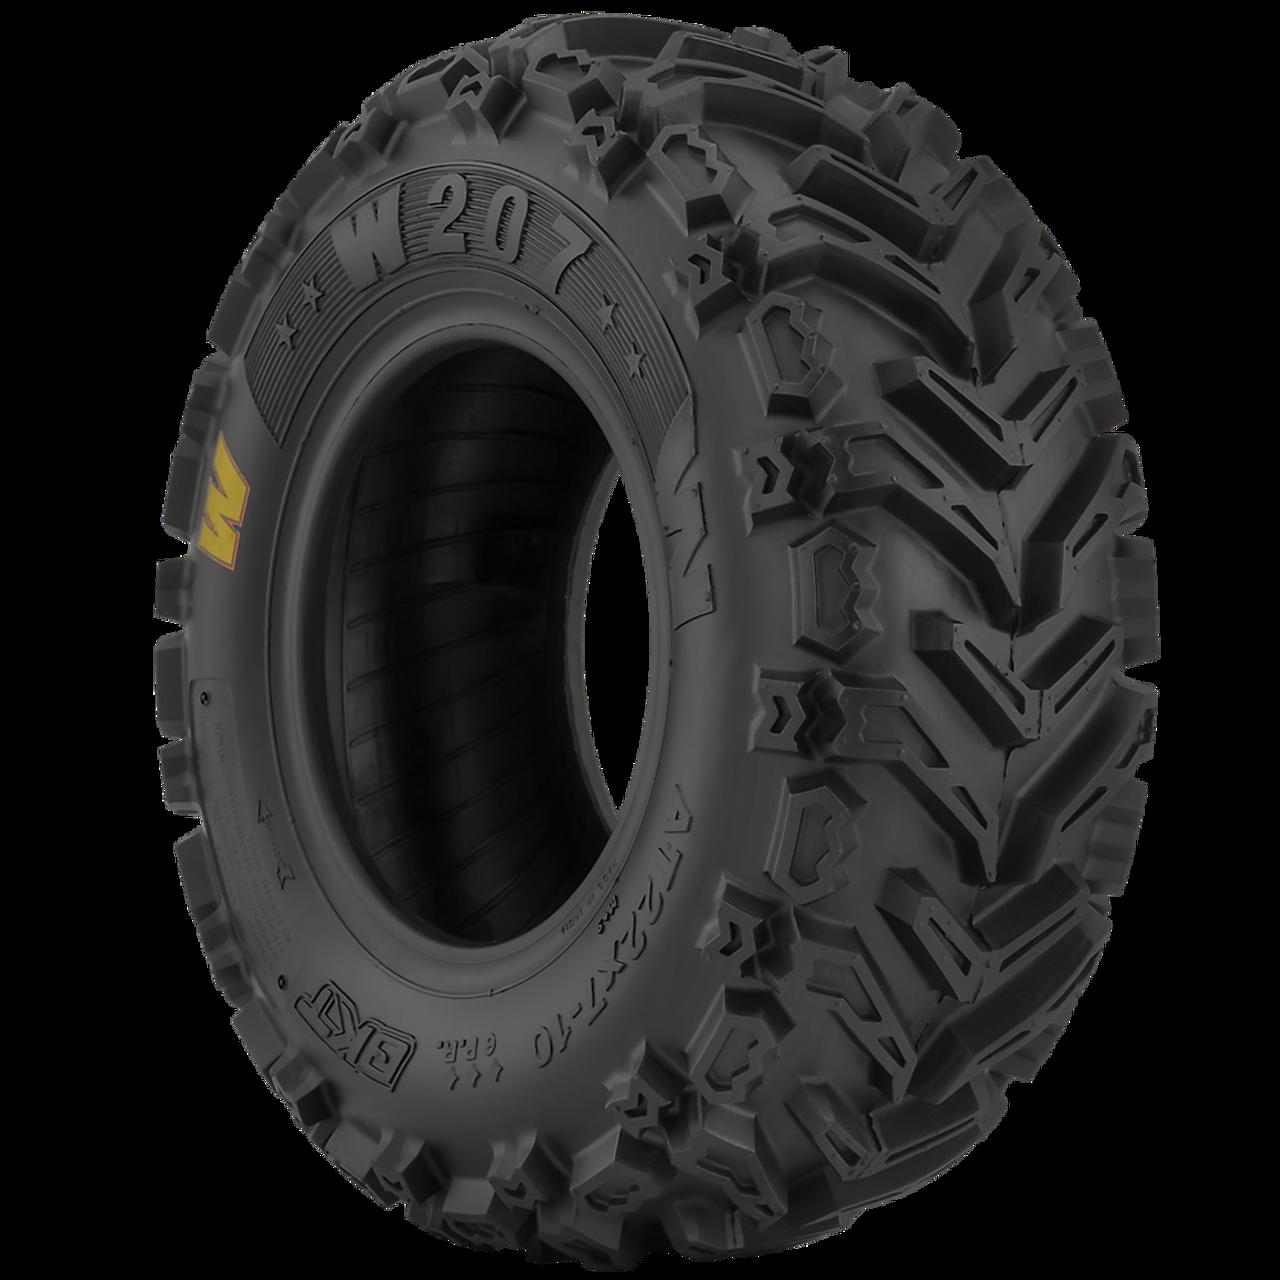 New Tire 25 10.00 12 BKT W207 6 ply ATV 25x10.00-12